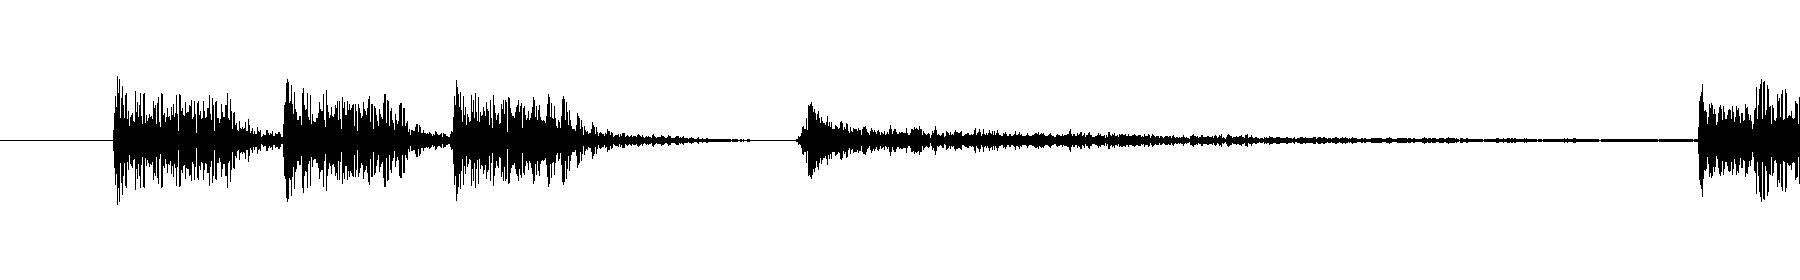 14 music g